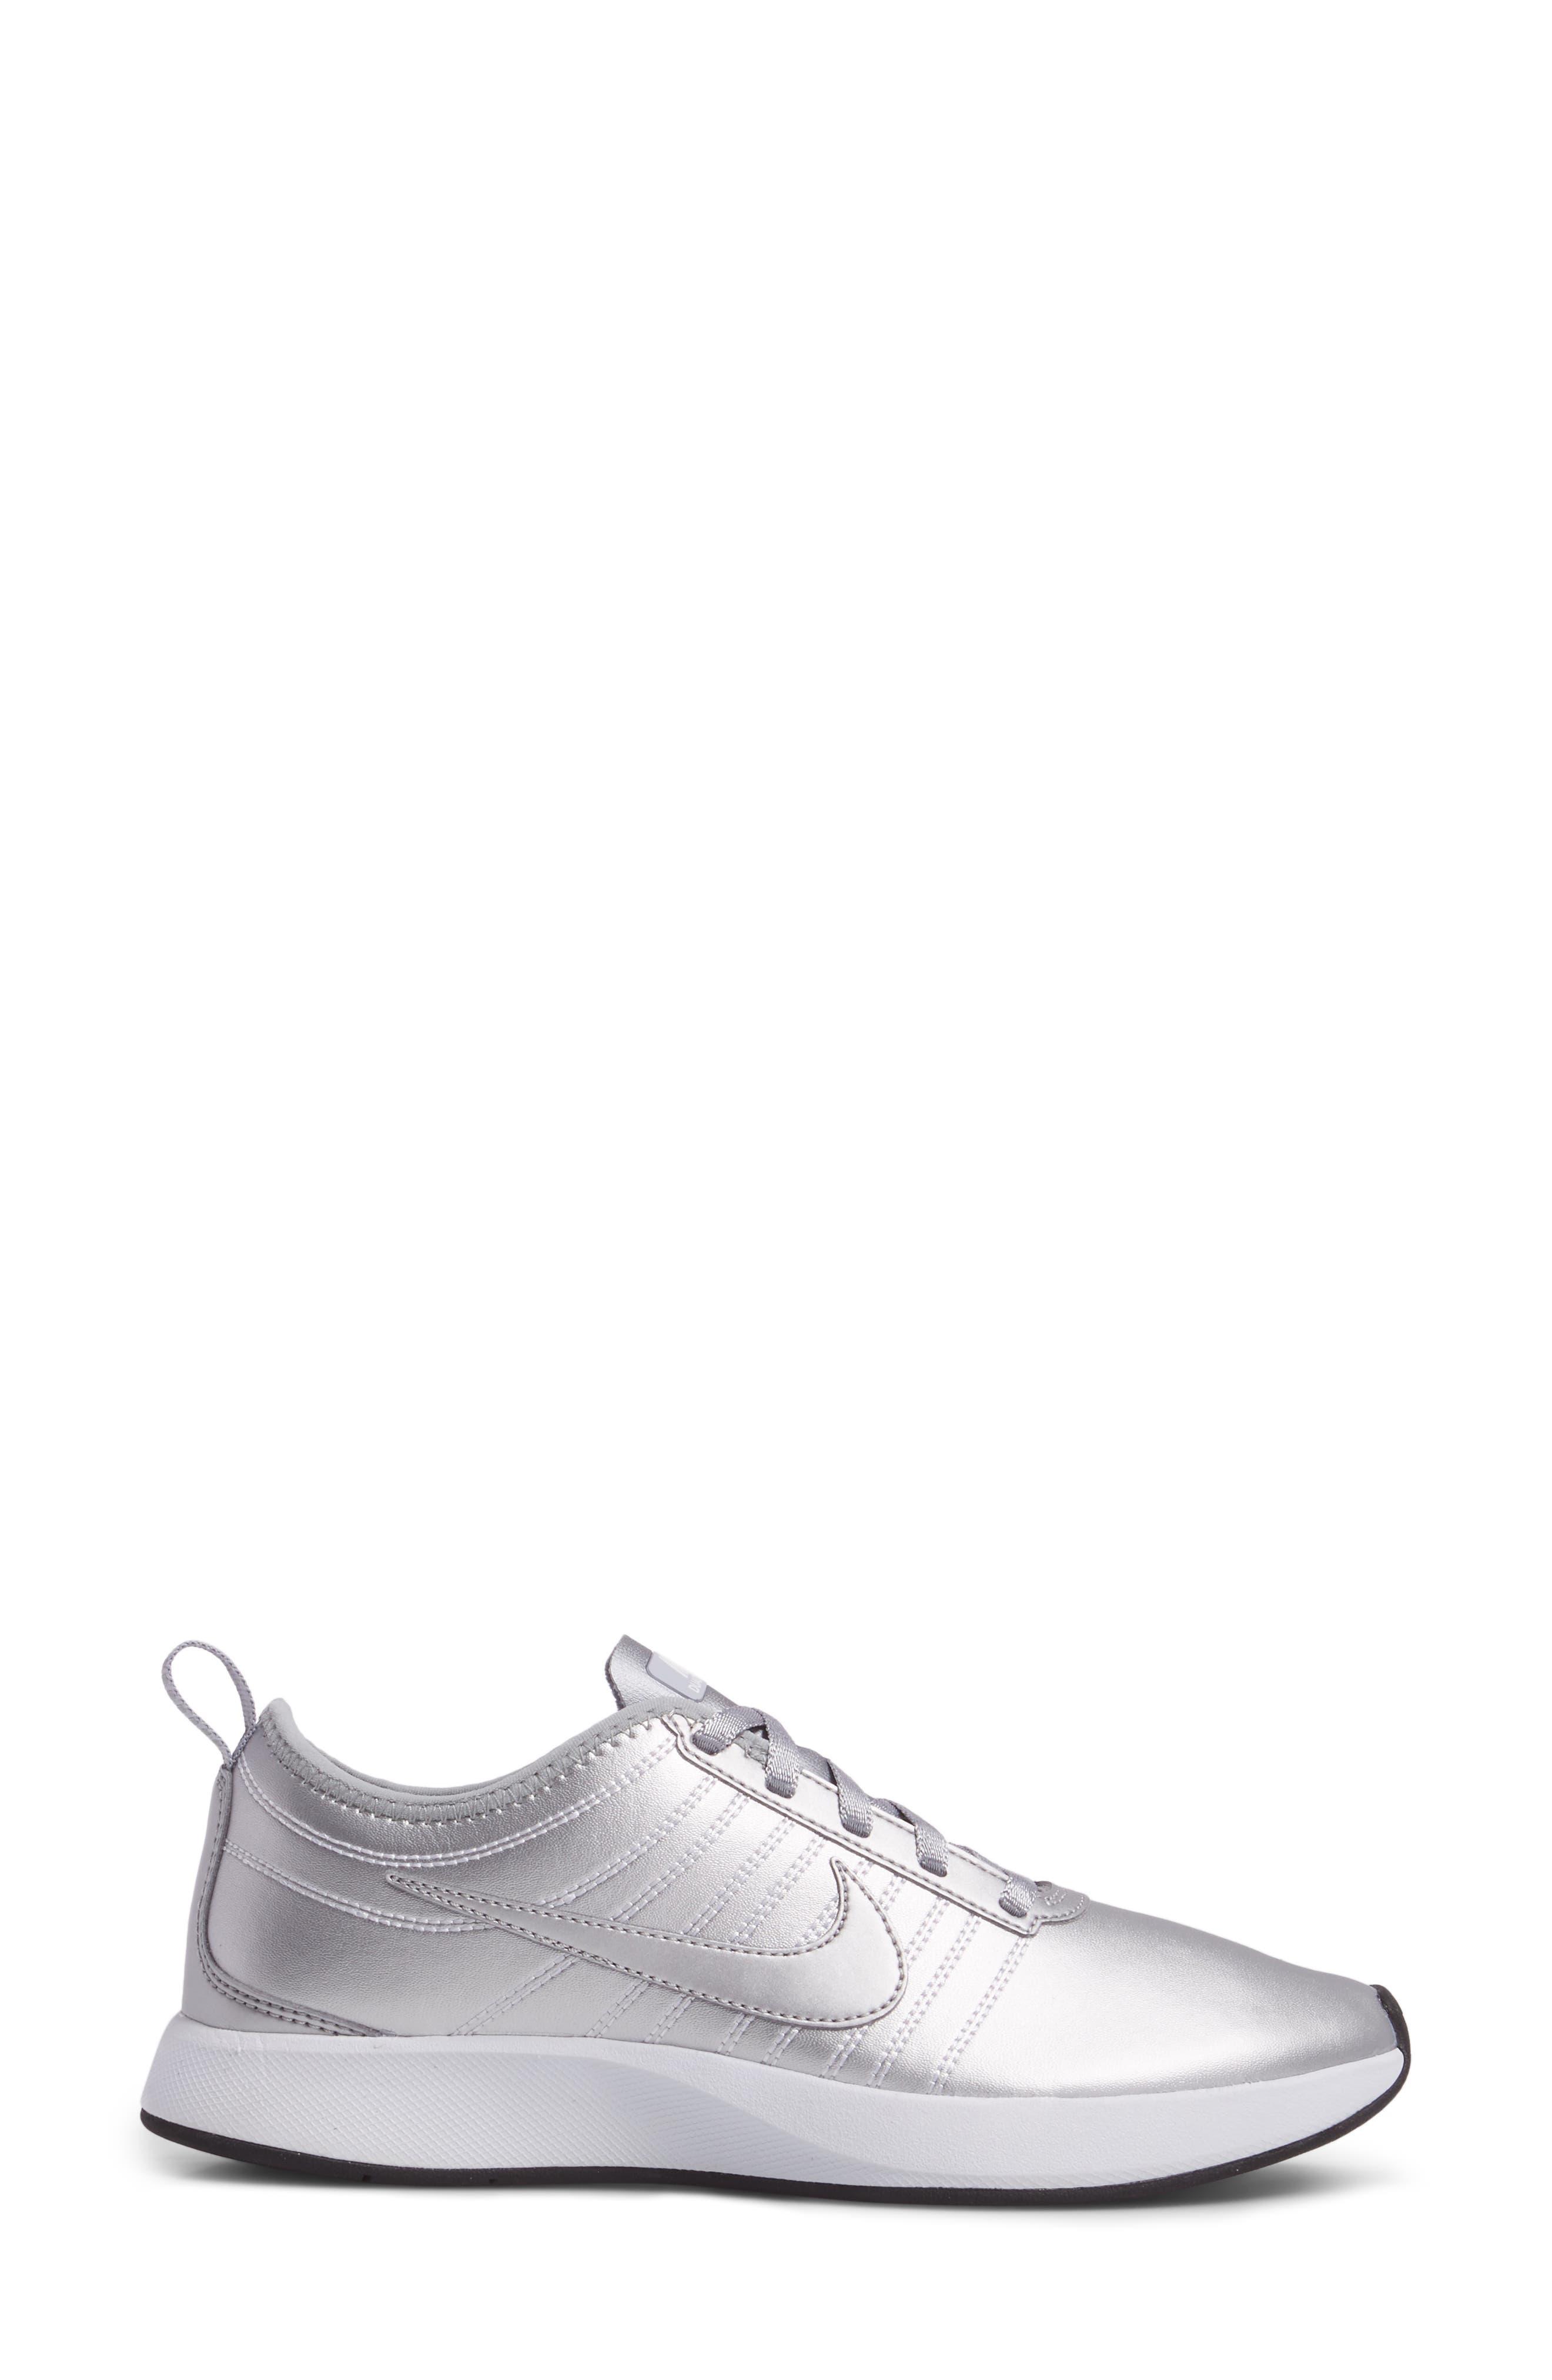 Dualtone Racer PRM Sneaker,                             Alternate thumbnail 12, color,